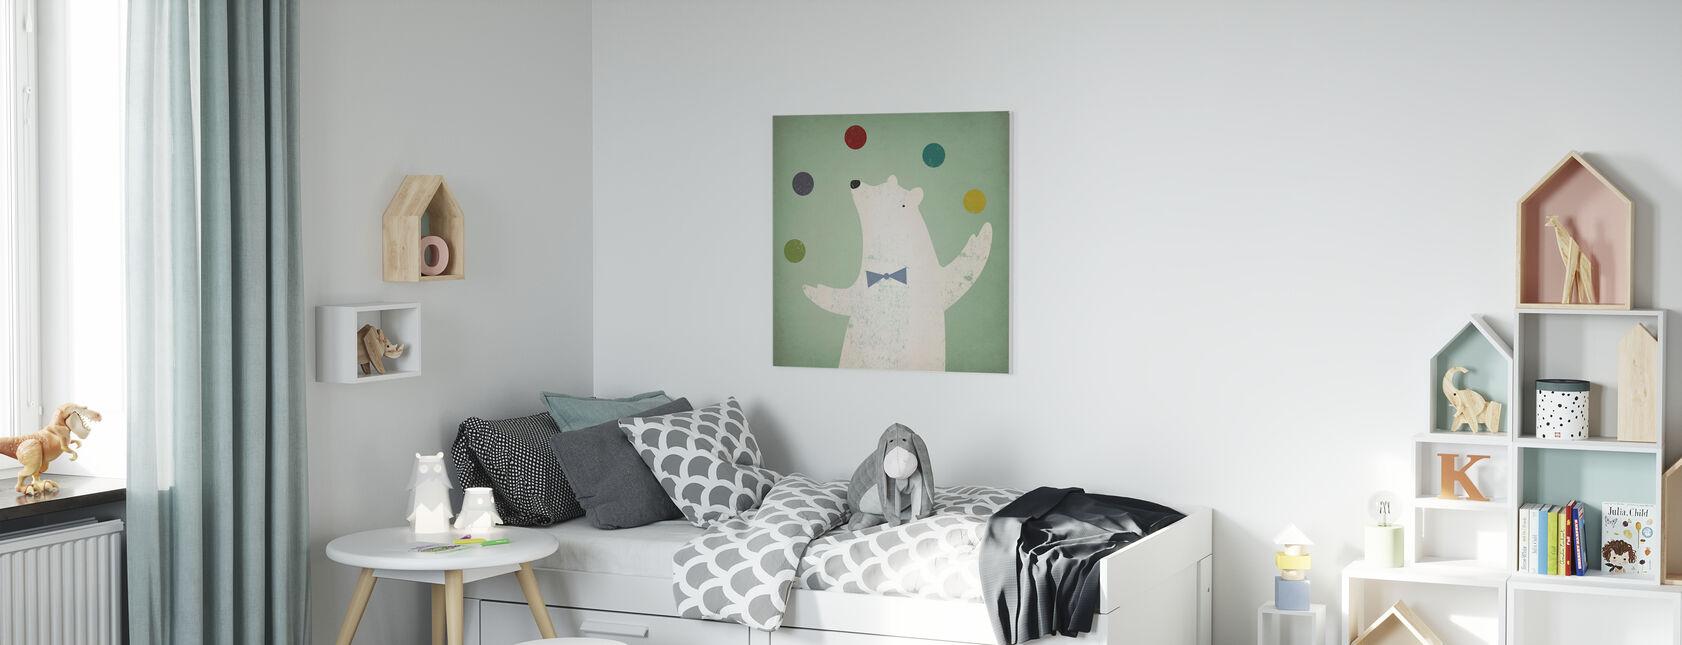 Sirkus jääkarhu - Canvastaulu - Lastenhuone